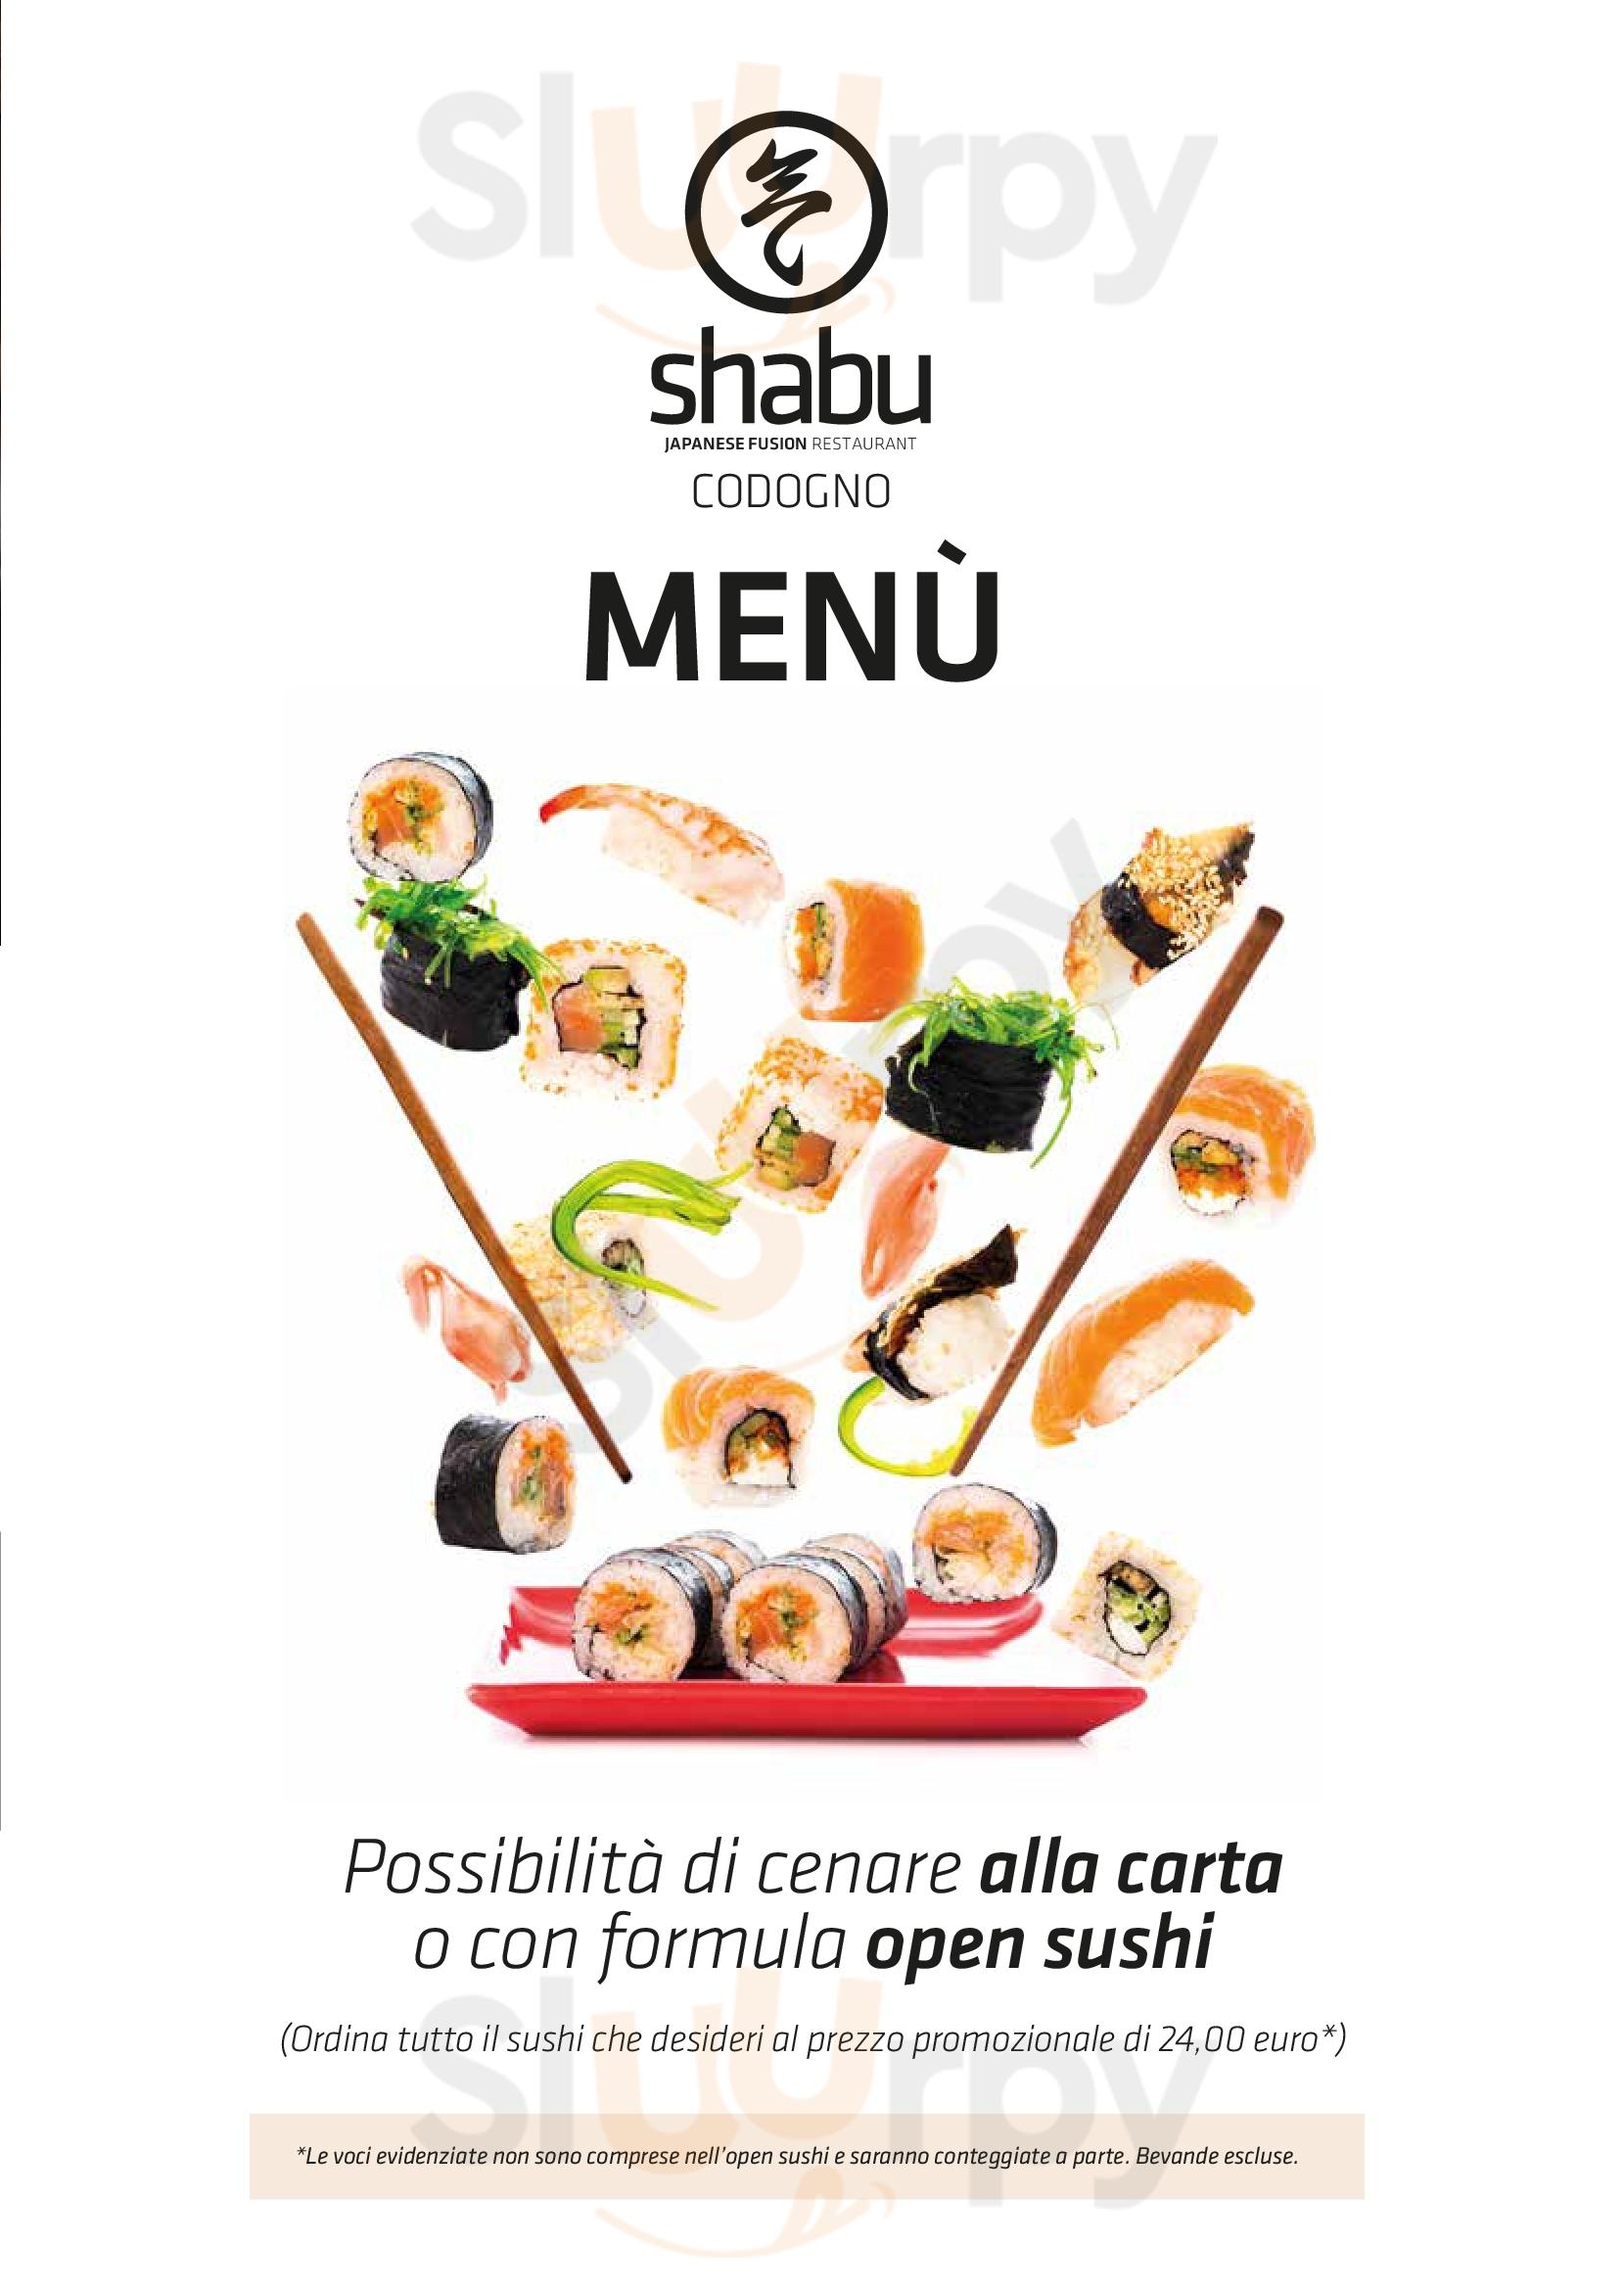 Shabu Japanese Fusion Restaurant Codogno menù 1 pagina